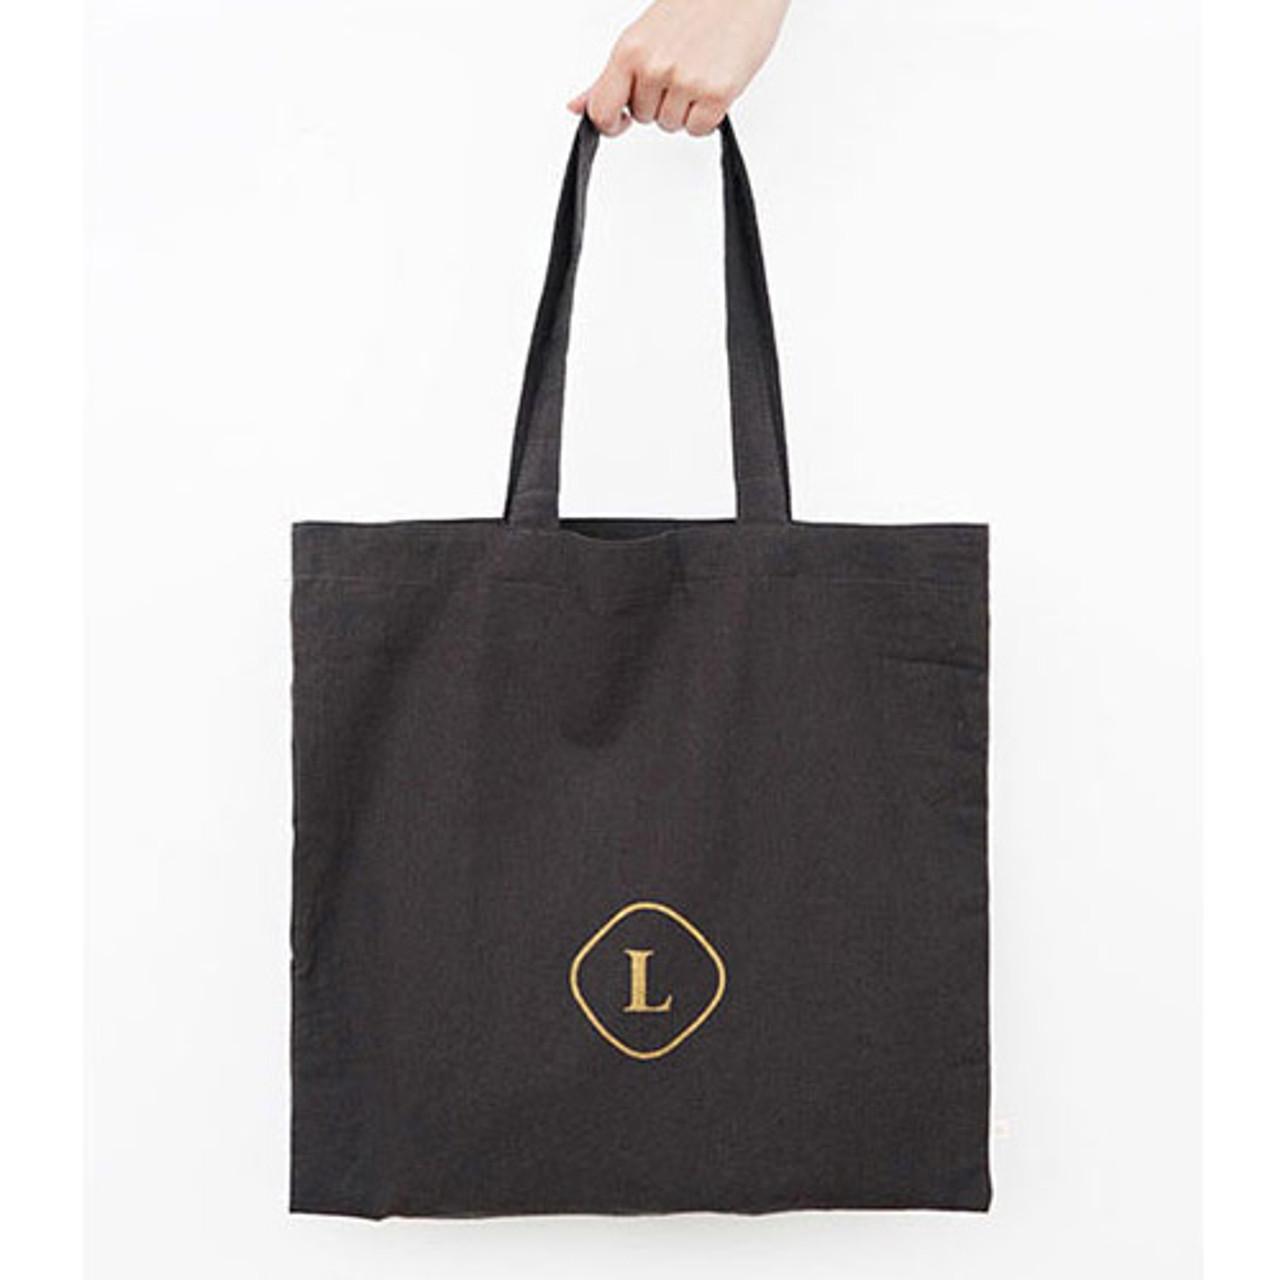 b12cab941 Invite.L Linen 1 square eco shoulder tote bag - fallindesign